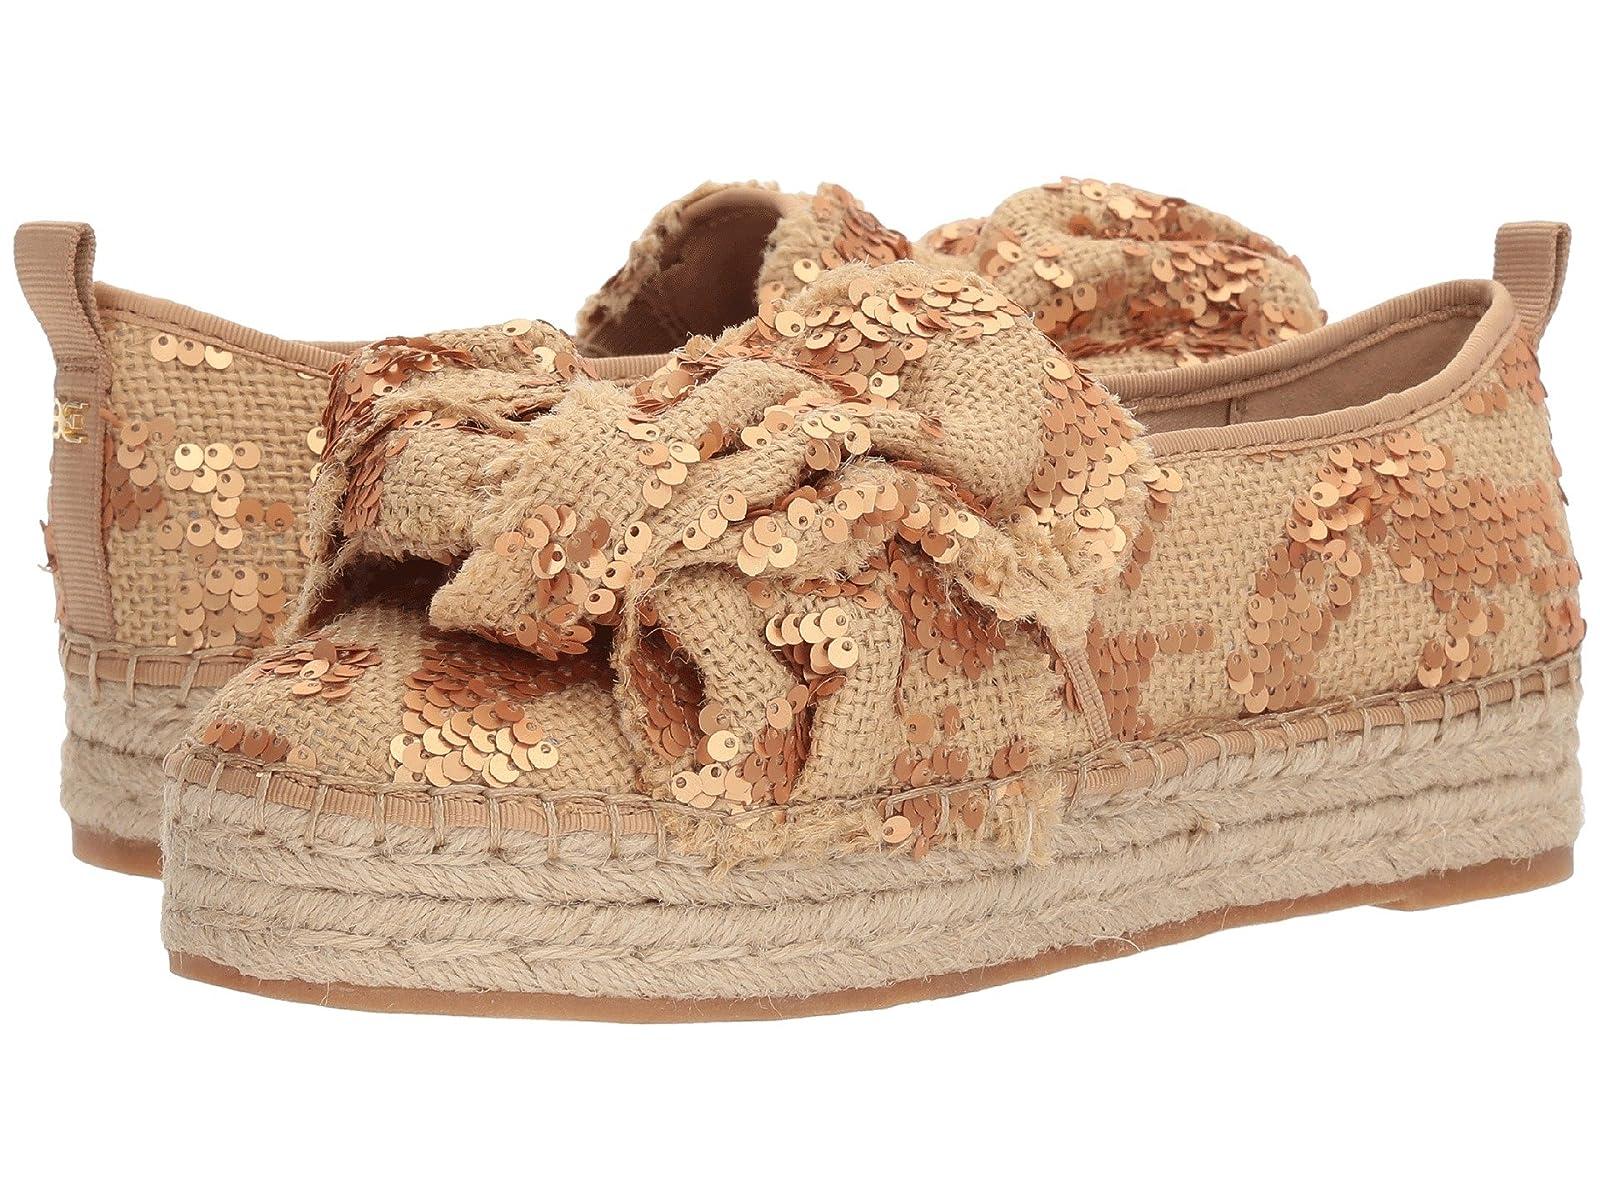 Sam Edelman CabreraCheap and distinctive eye-catching shoes